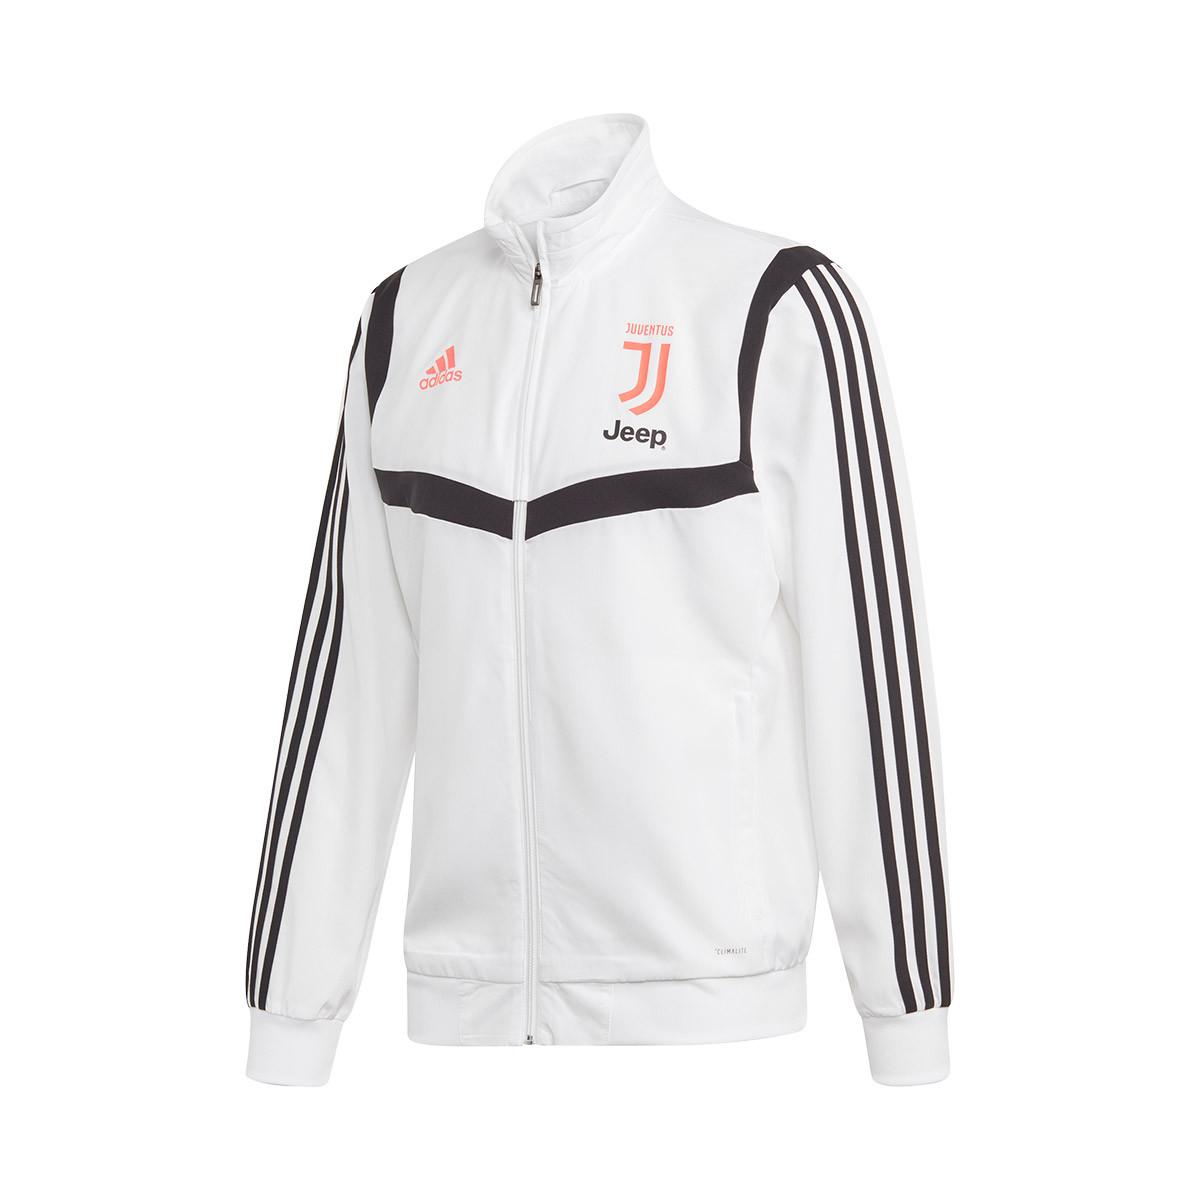 Chaqueta adidas Juventus Pre Match 2019 2020 Niño